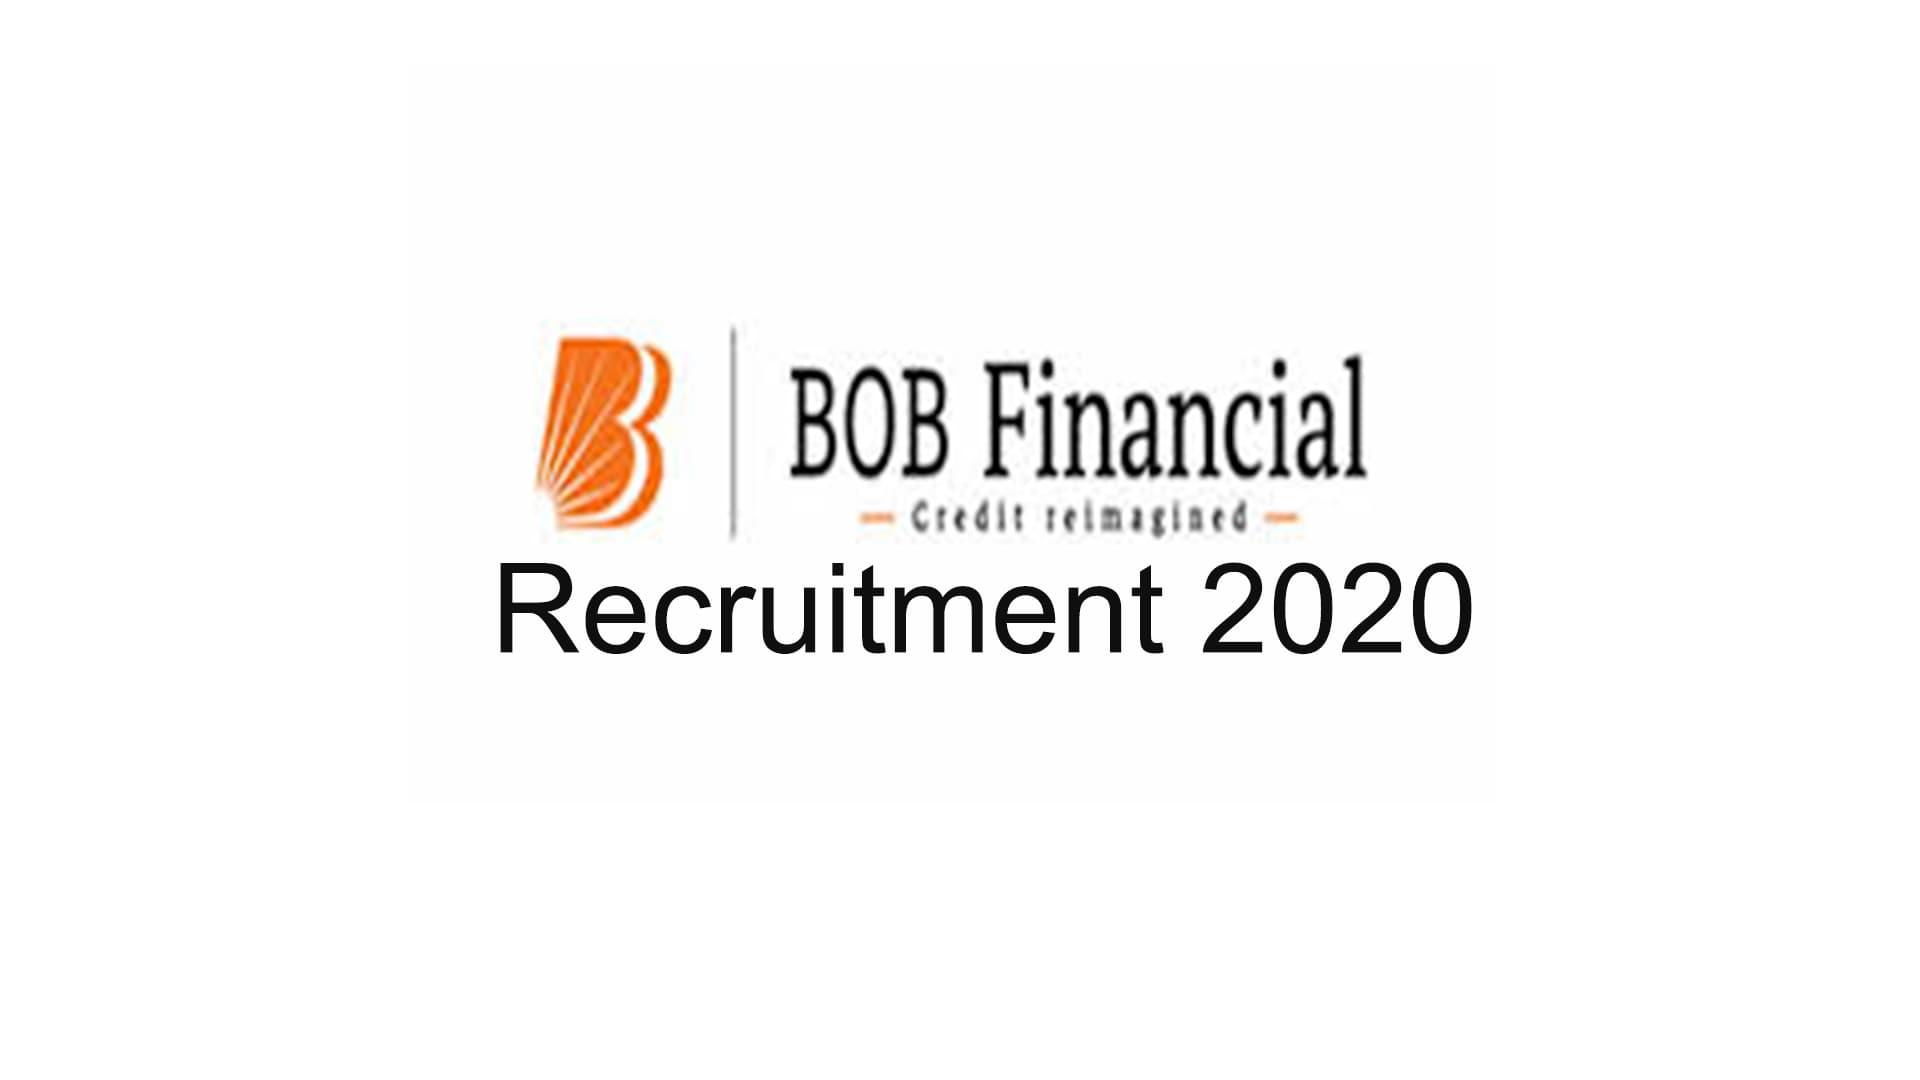 BOB Financial Recruitment 2020